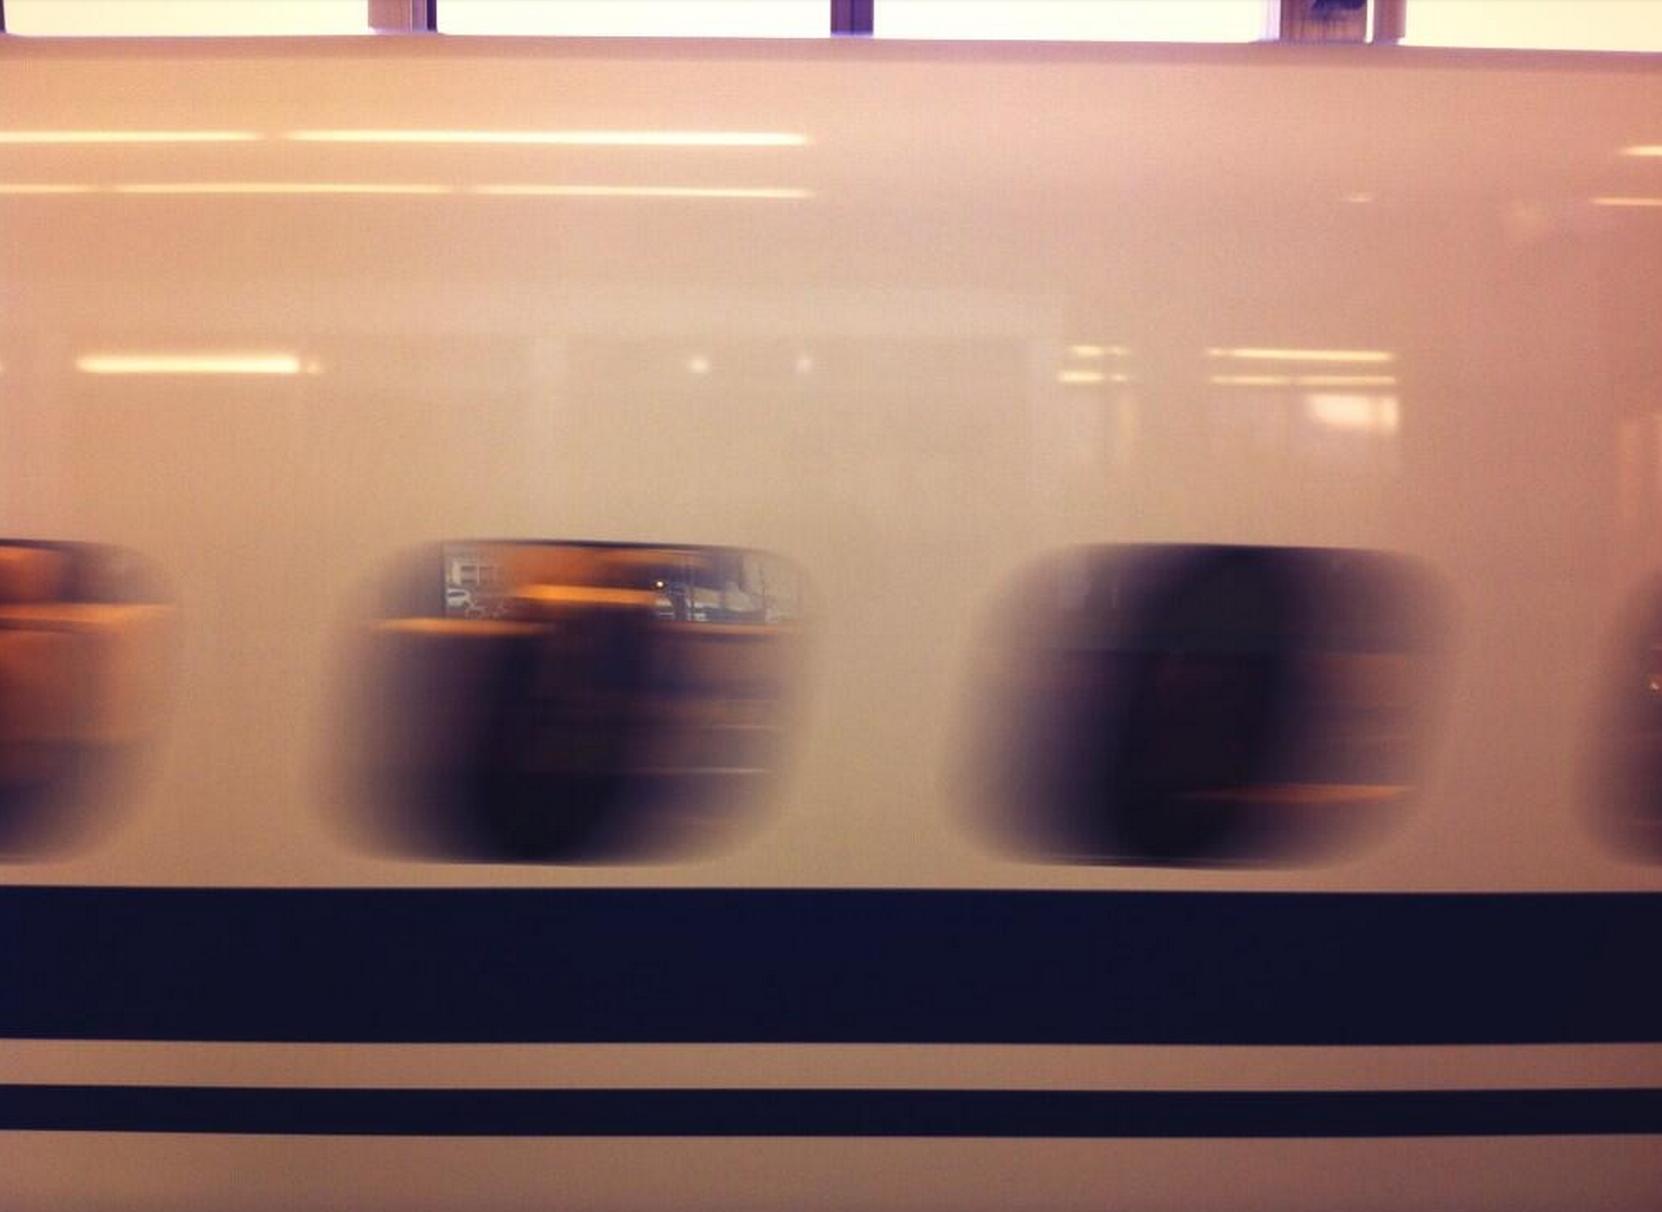 Shinkansen bullet train headed to Tokyo, Japan